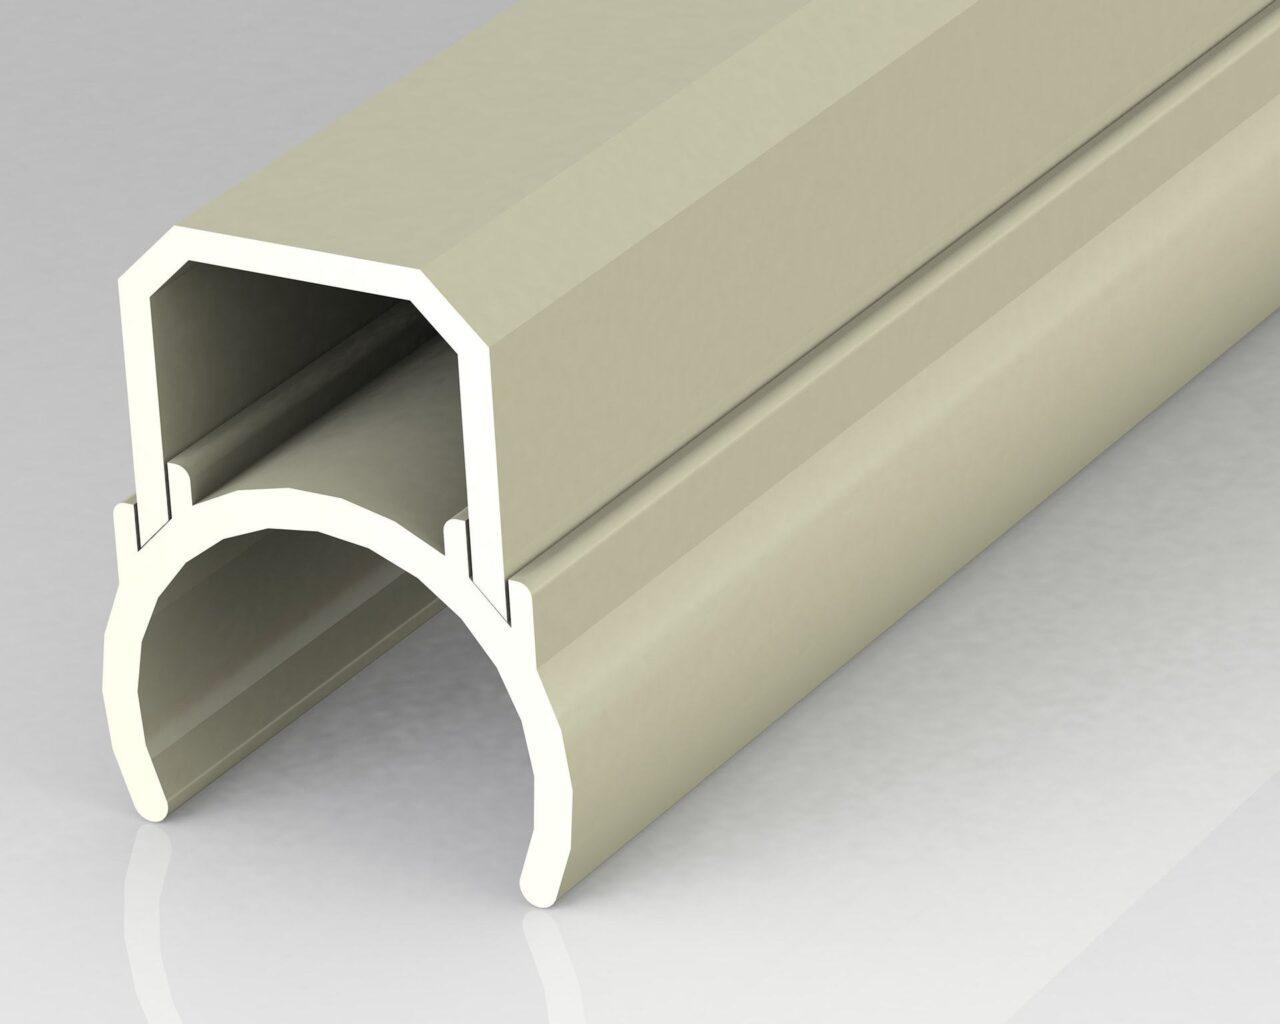 PEK3 Easytube plastic profiles cable duct